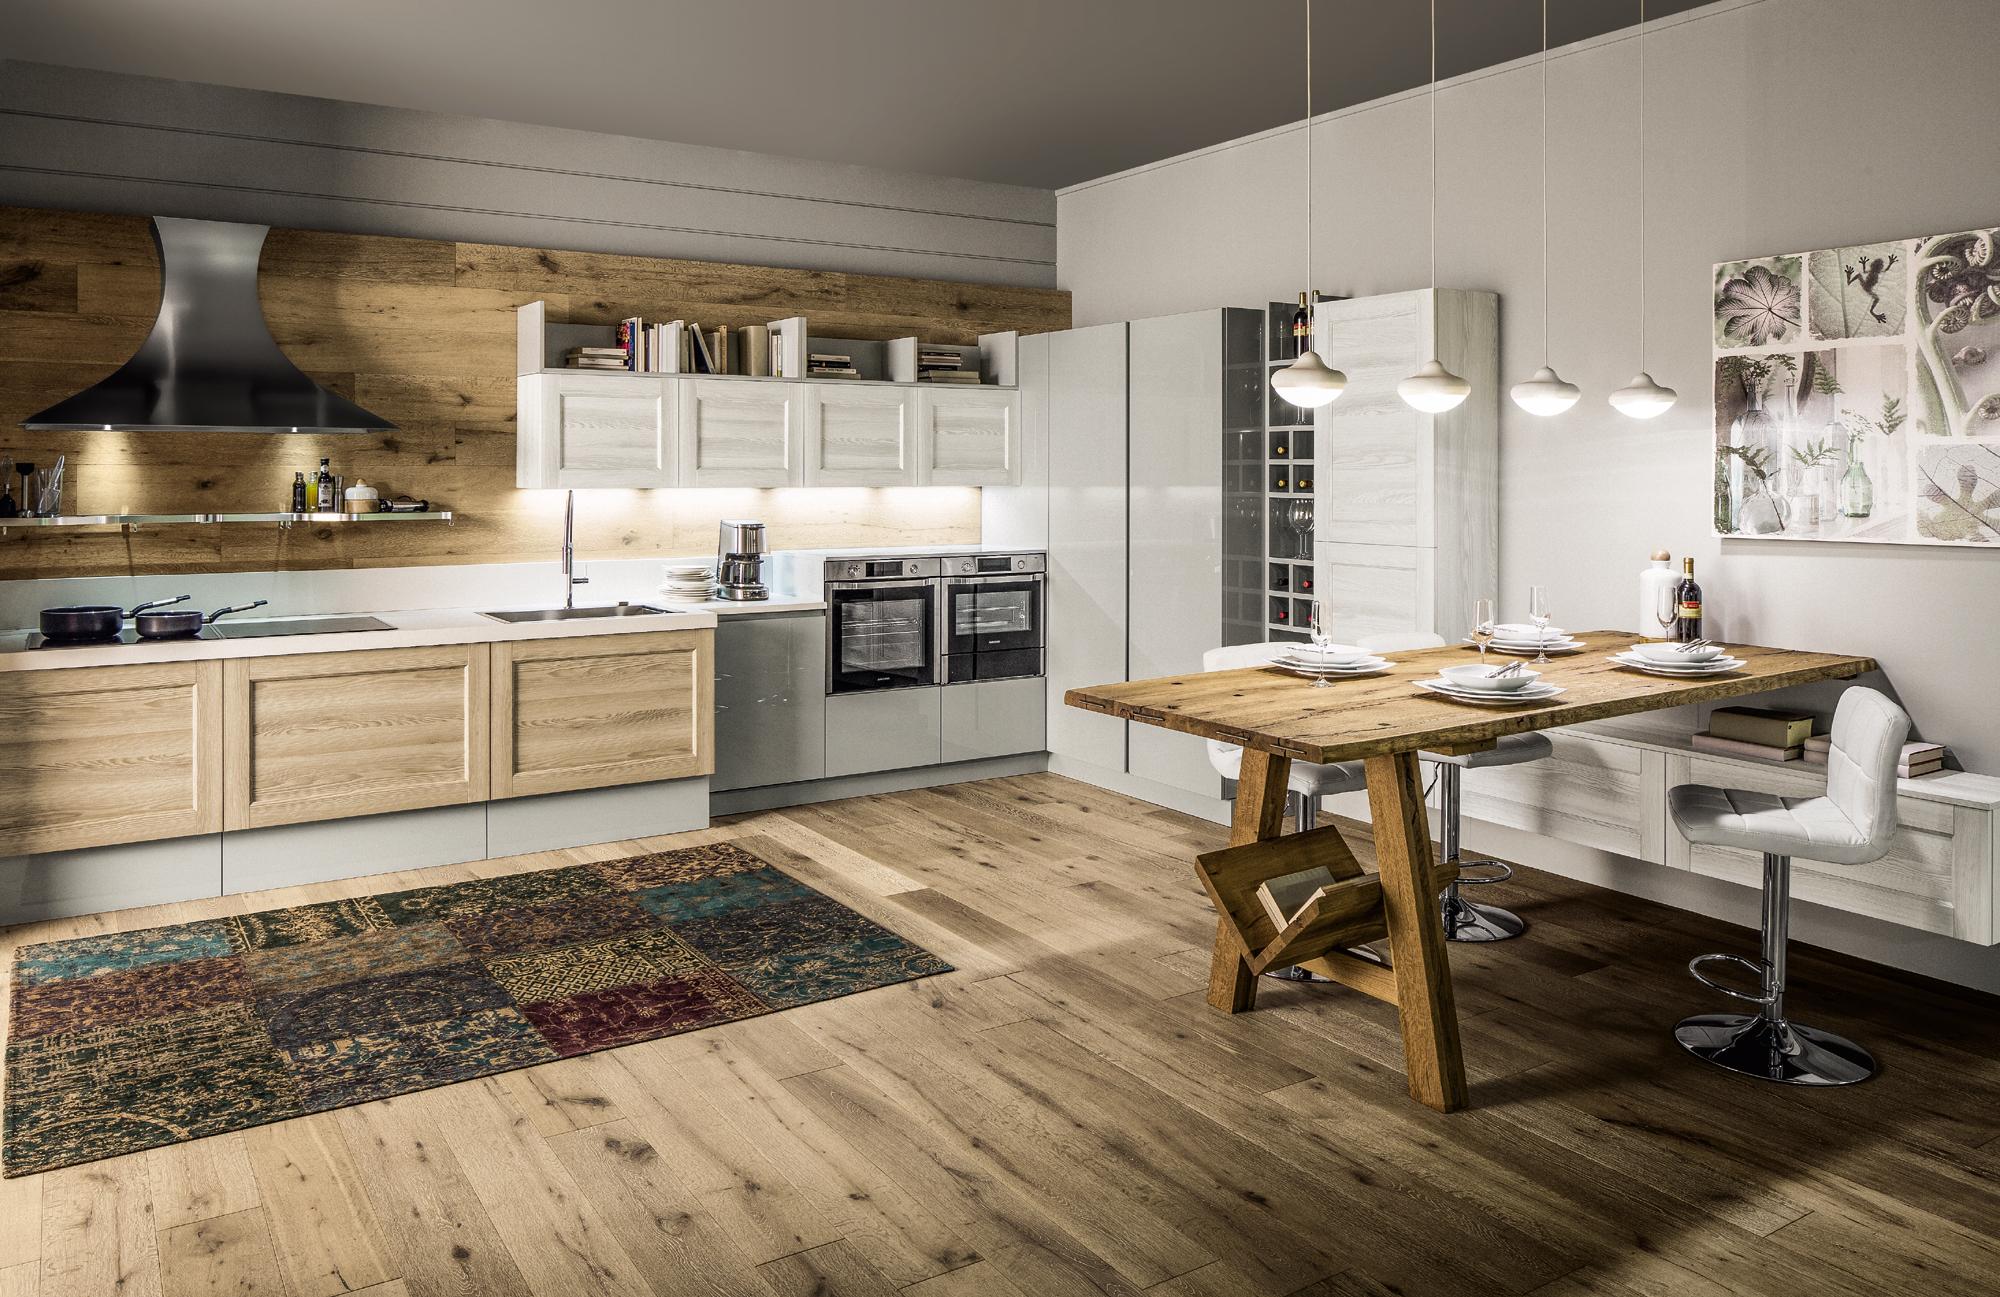 mobil-e arredamenti udine - arredamento per la casa - Mobili Moderni Udine